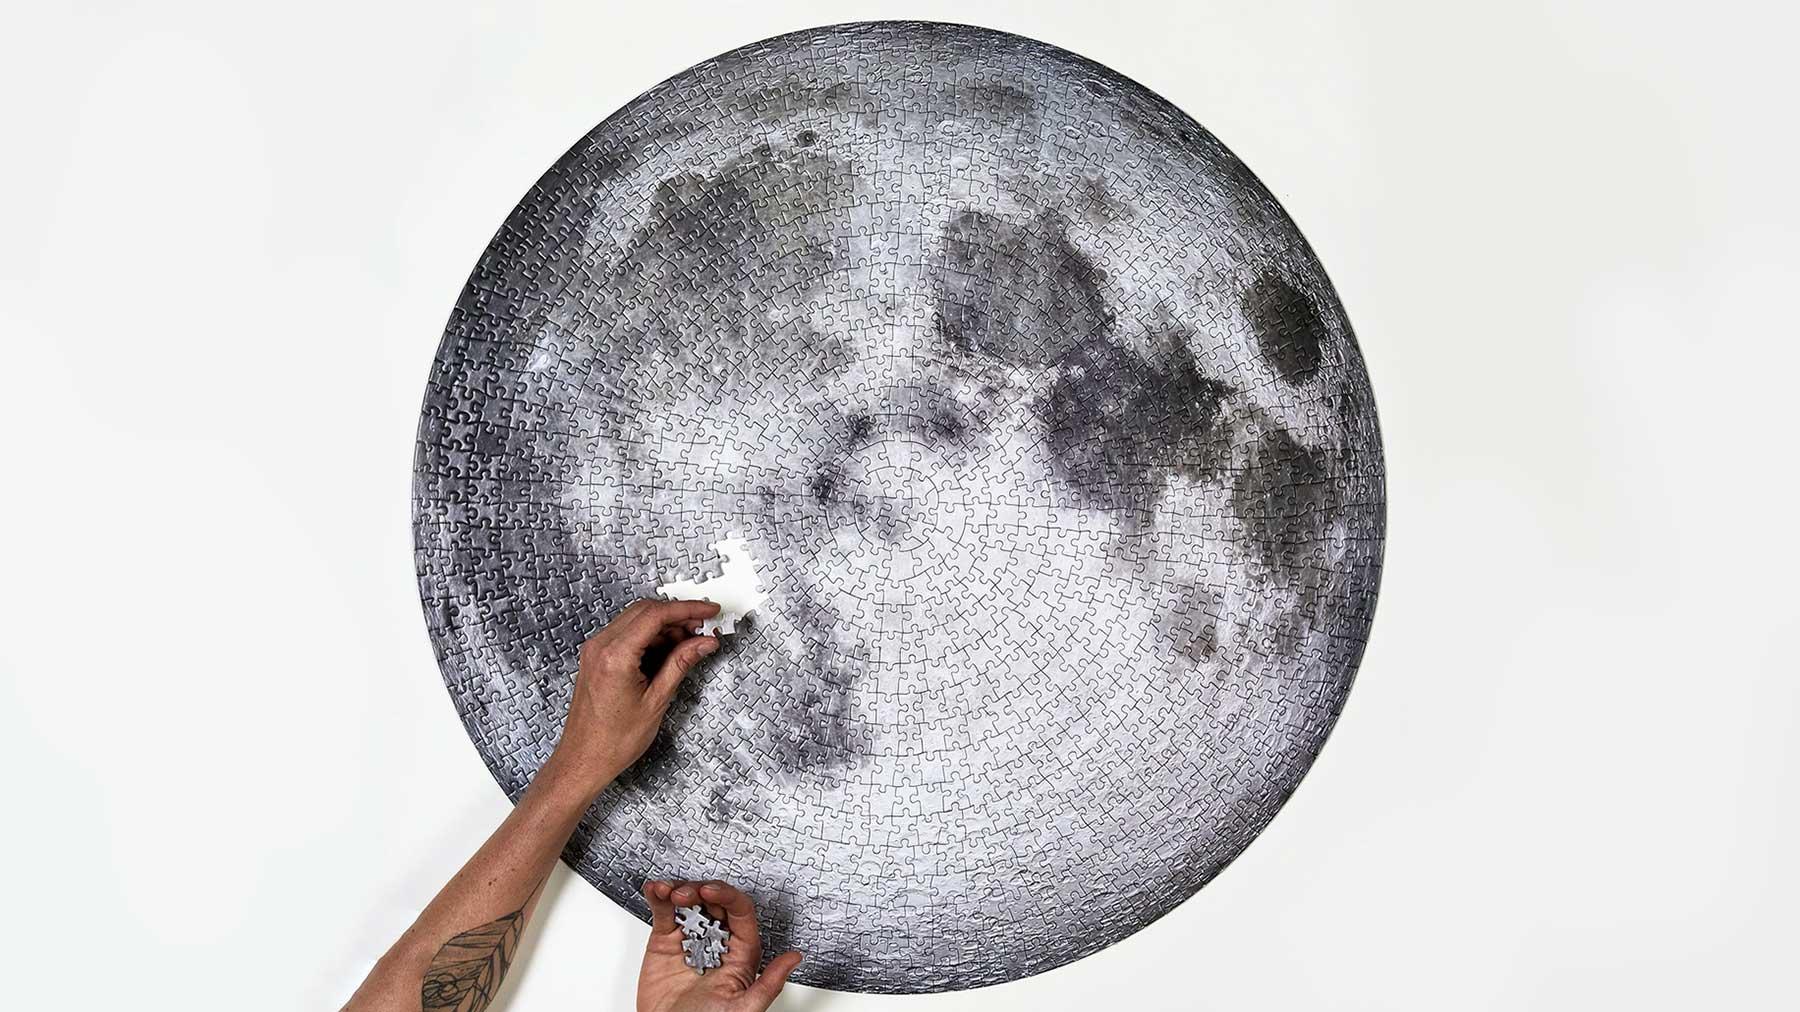 Mond-Puzzle & -Pinnwand